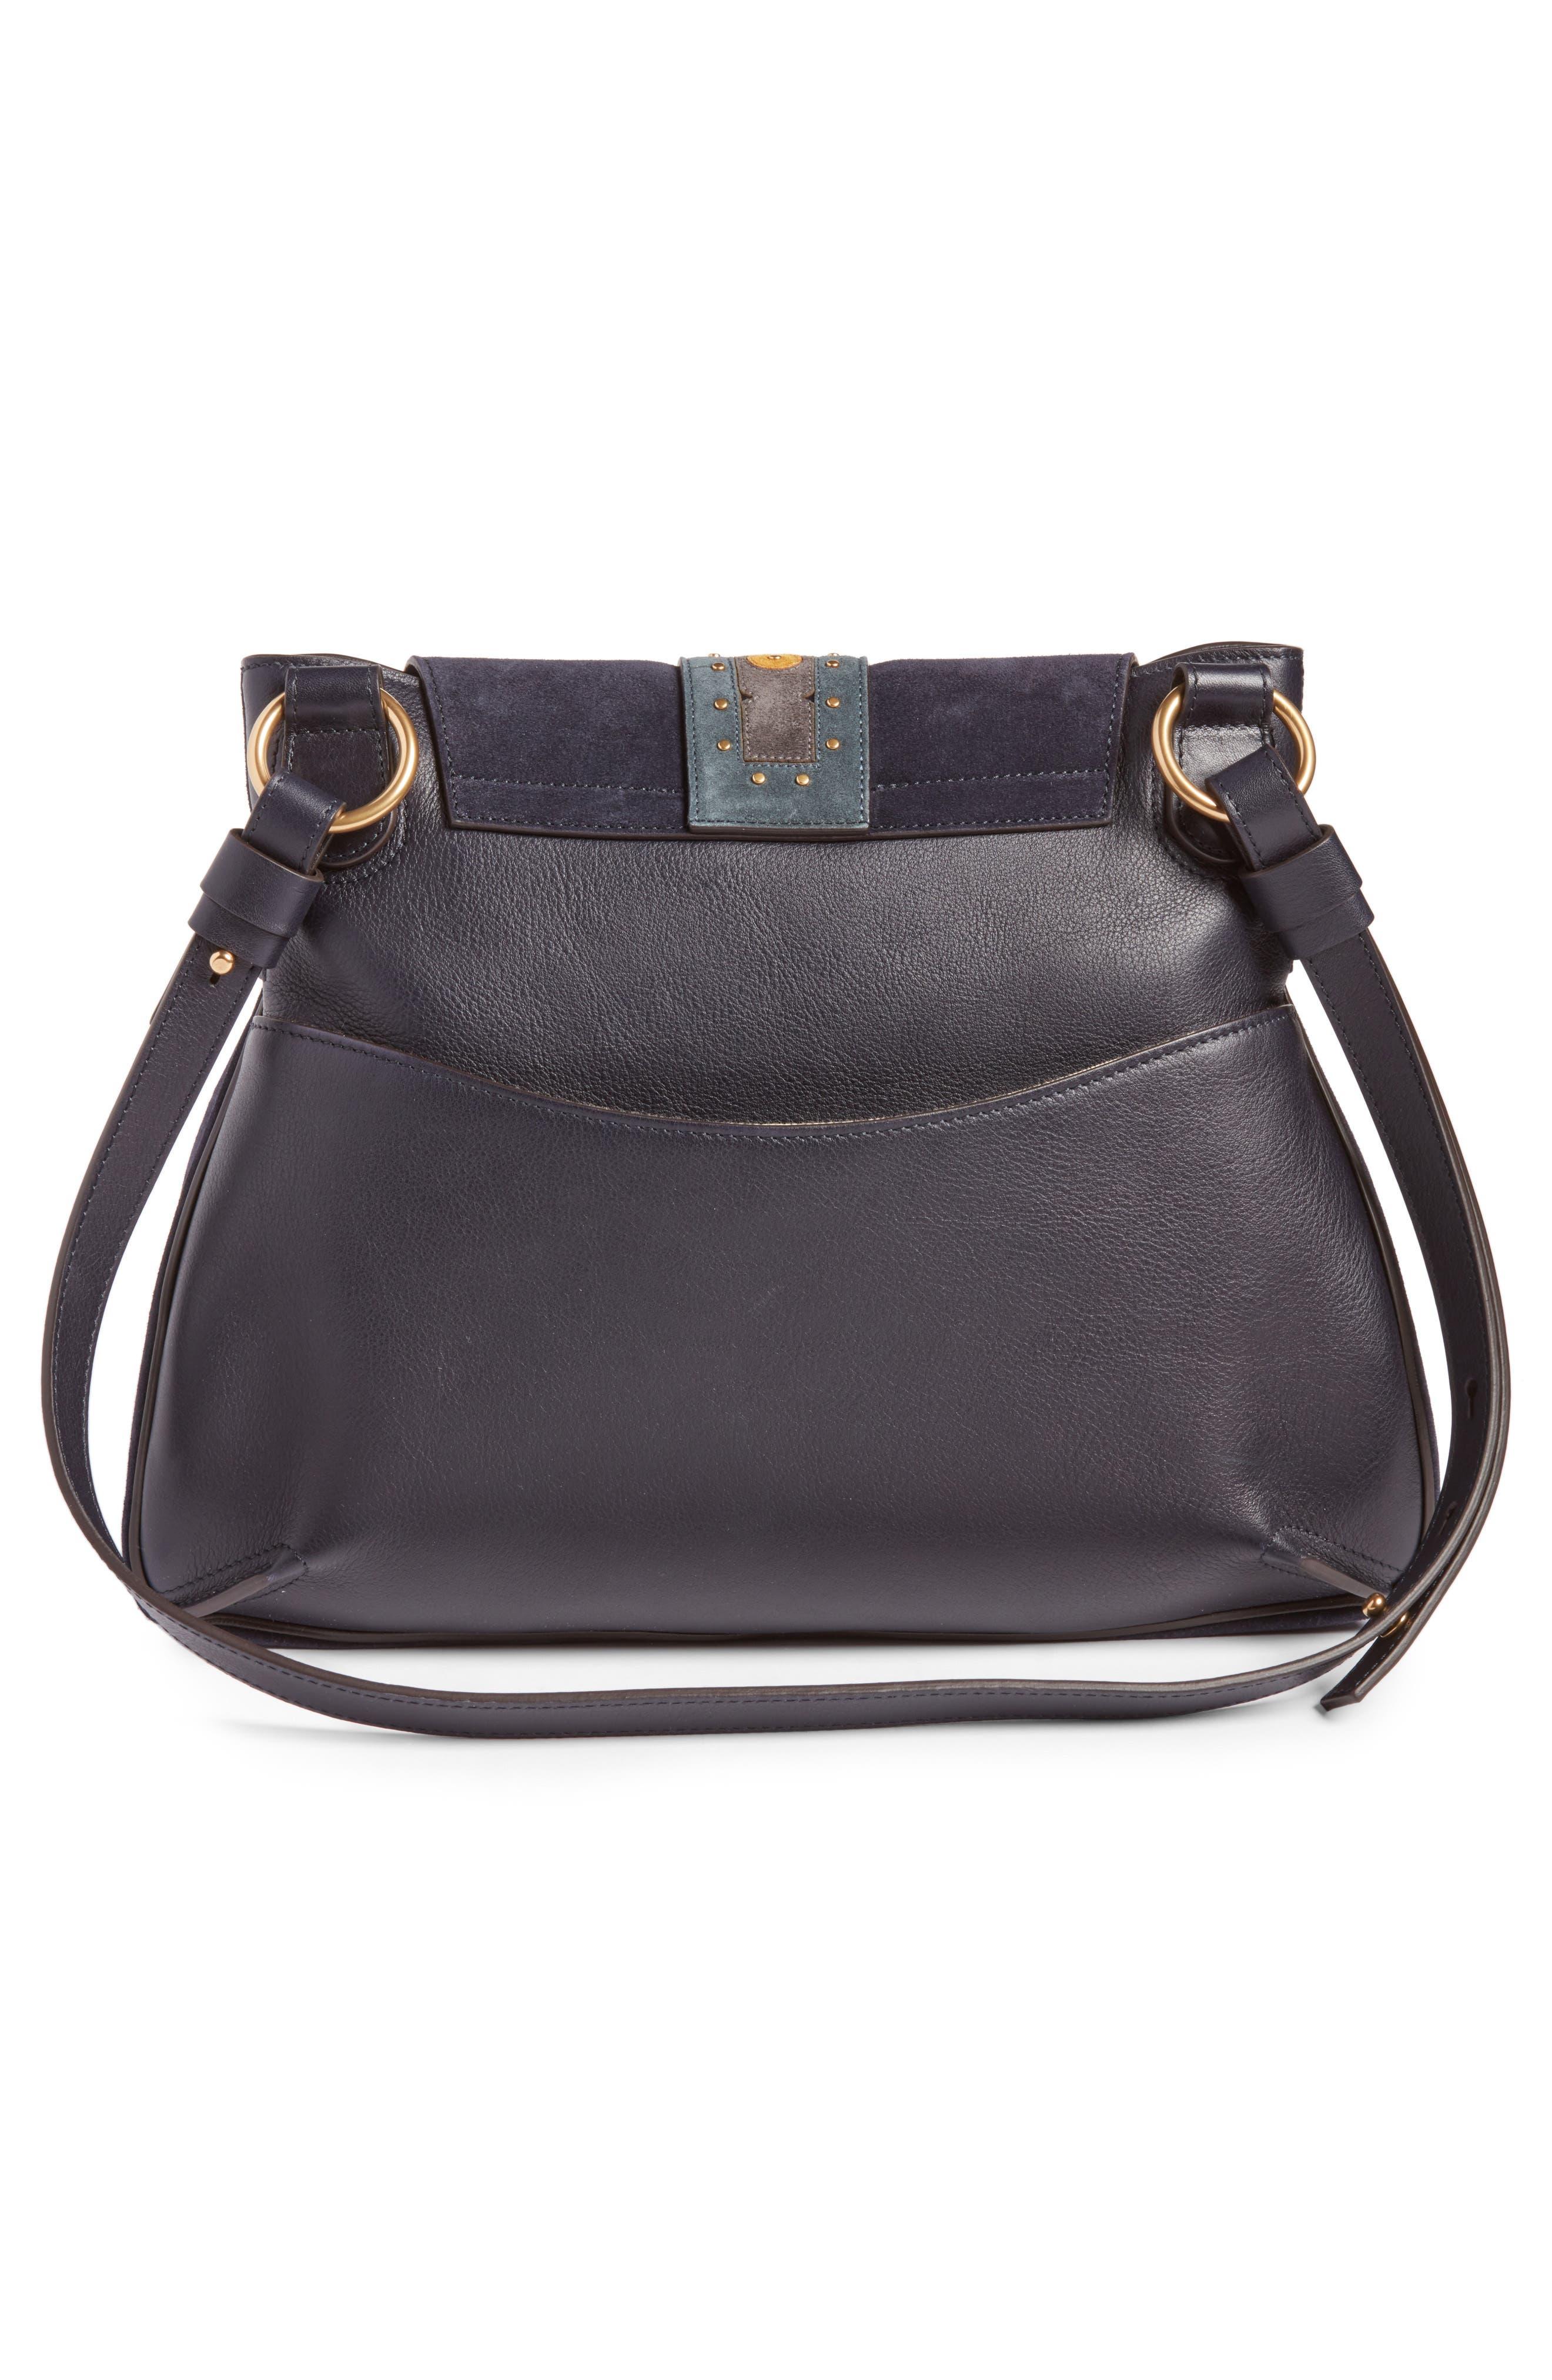 Medium Lexa Suede Shoulder Bag,                             Alternate thumbnail 2, color,                             412